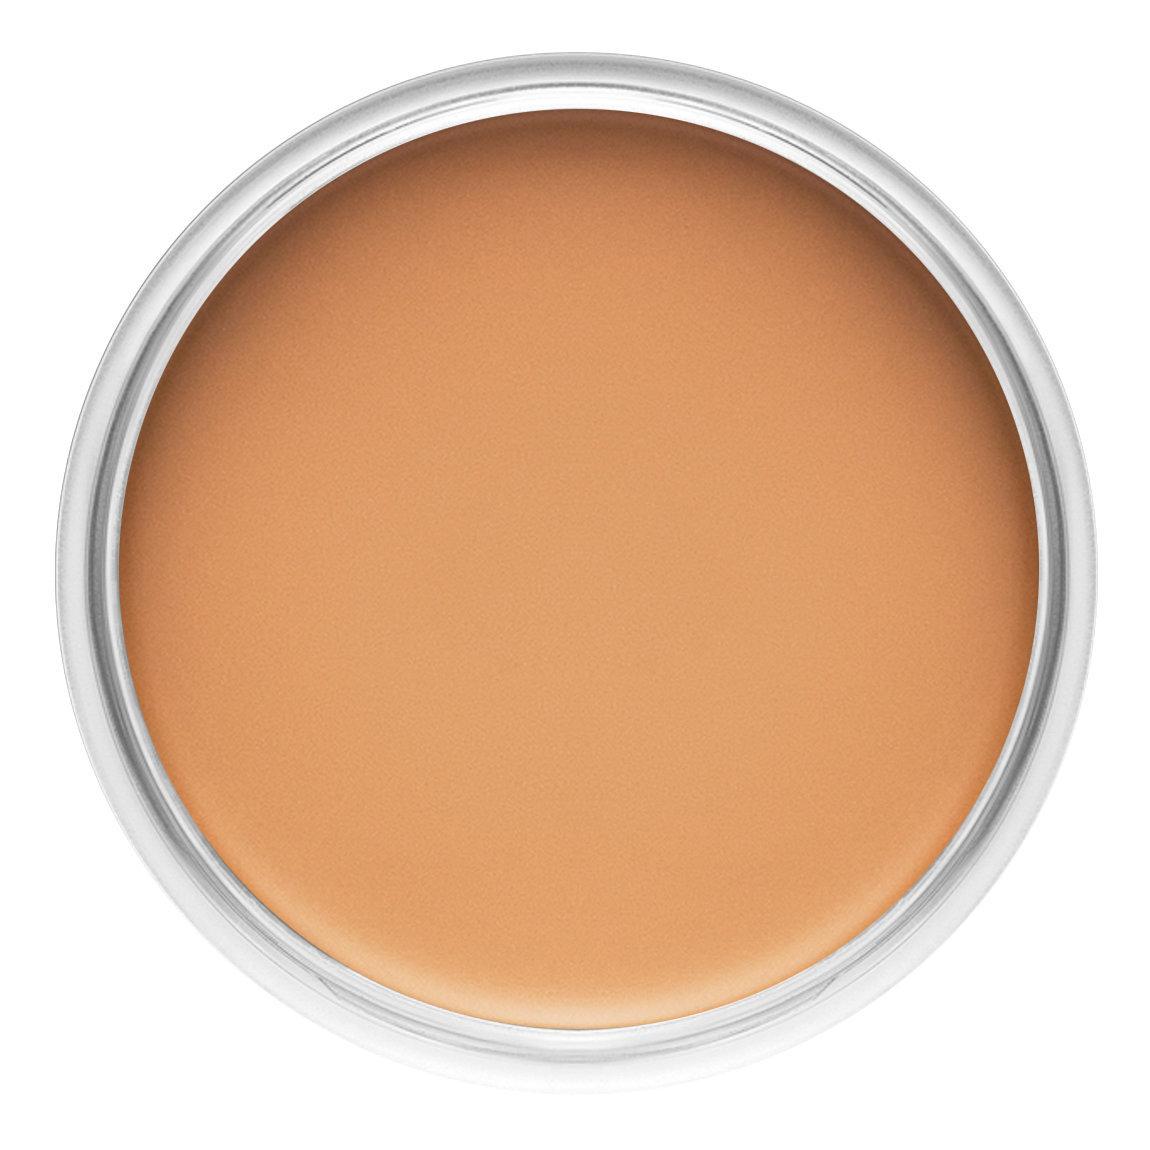 Anastasia Beverly Hills Cream Bronzer Sun Kissed alternative view 1 - product swatch.